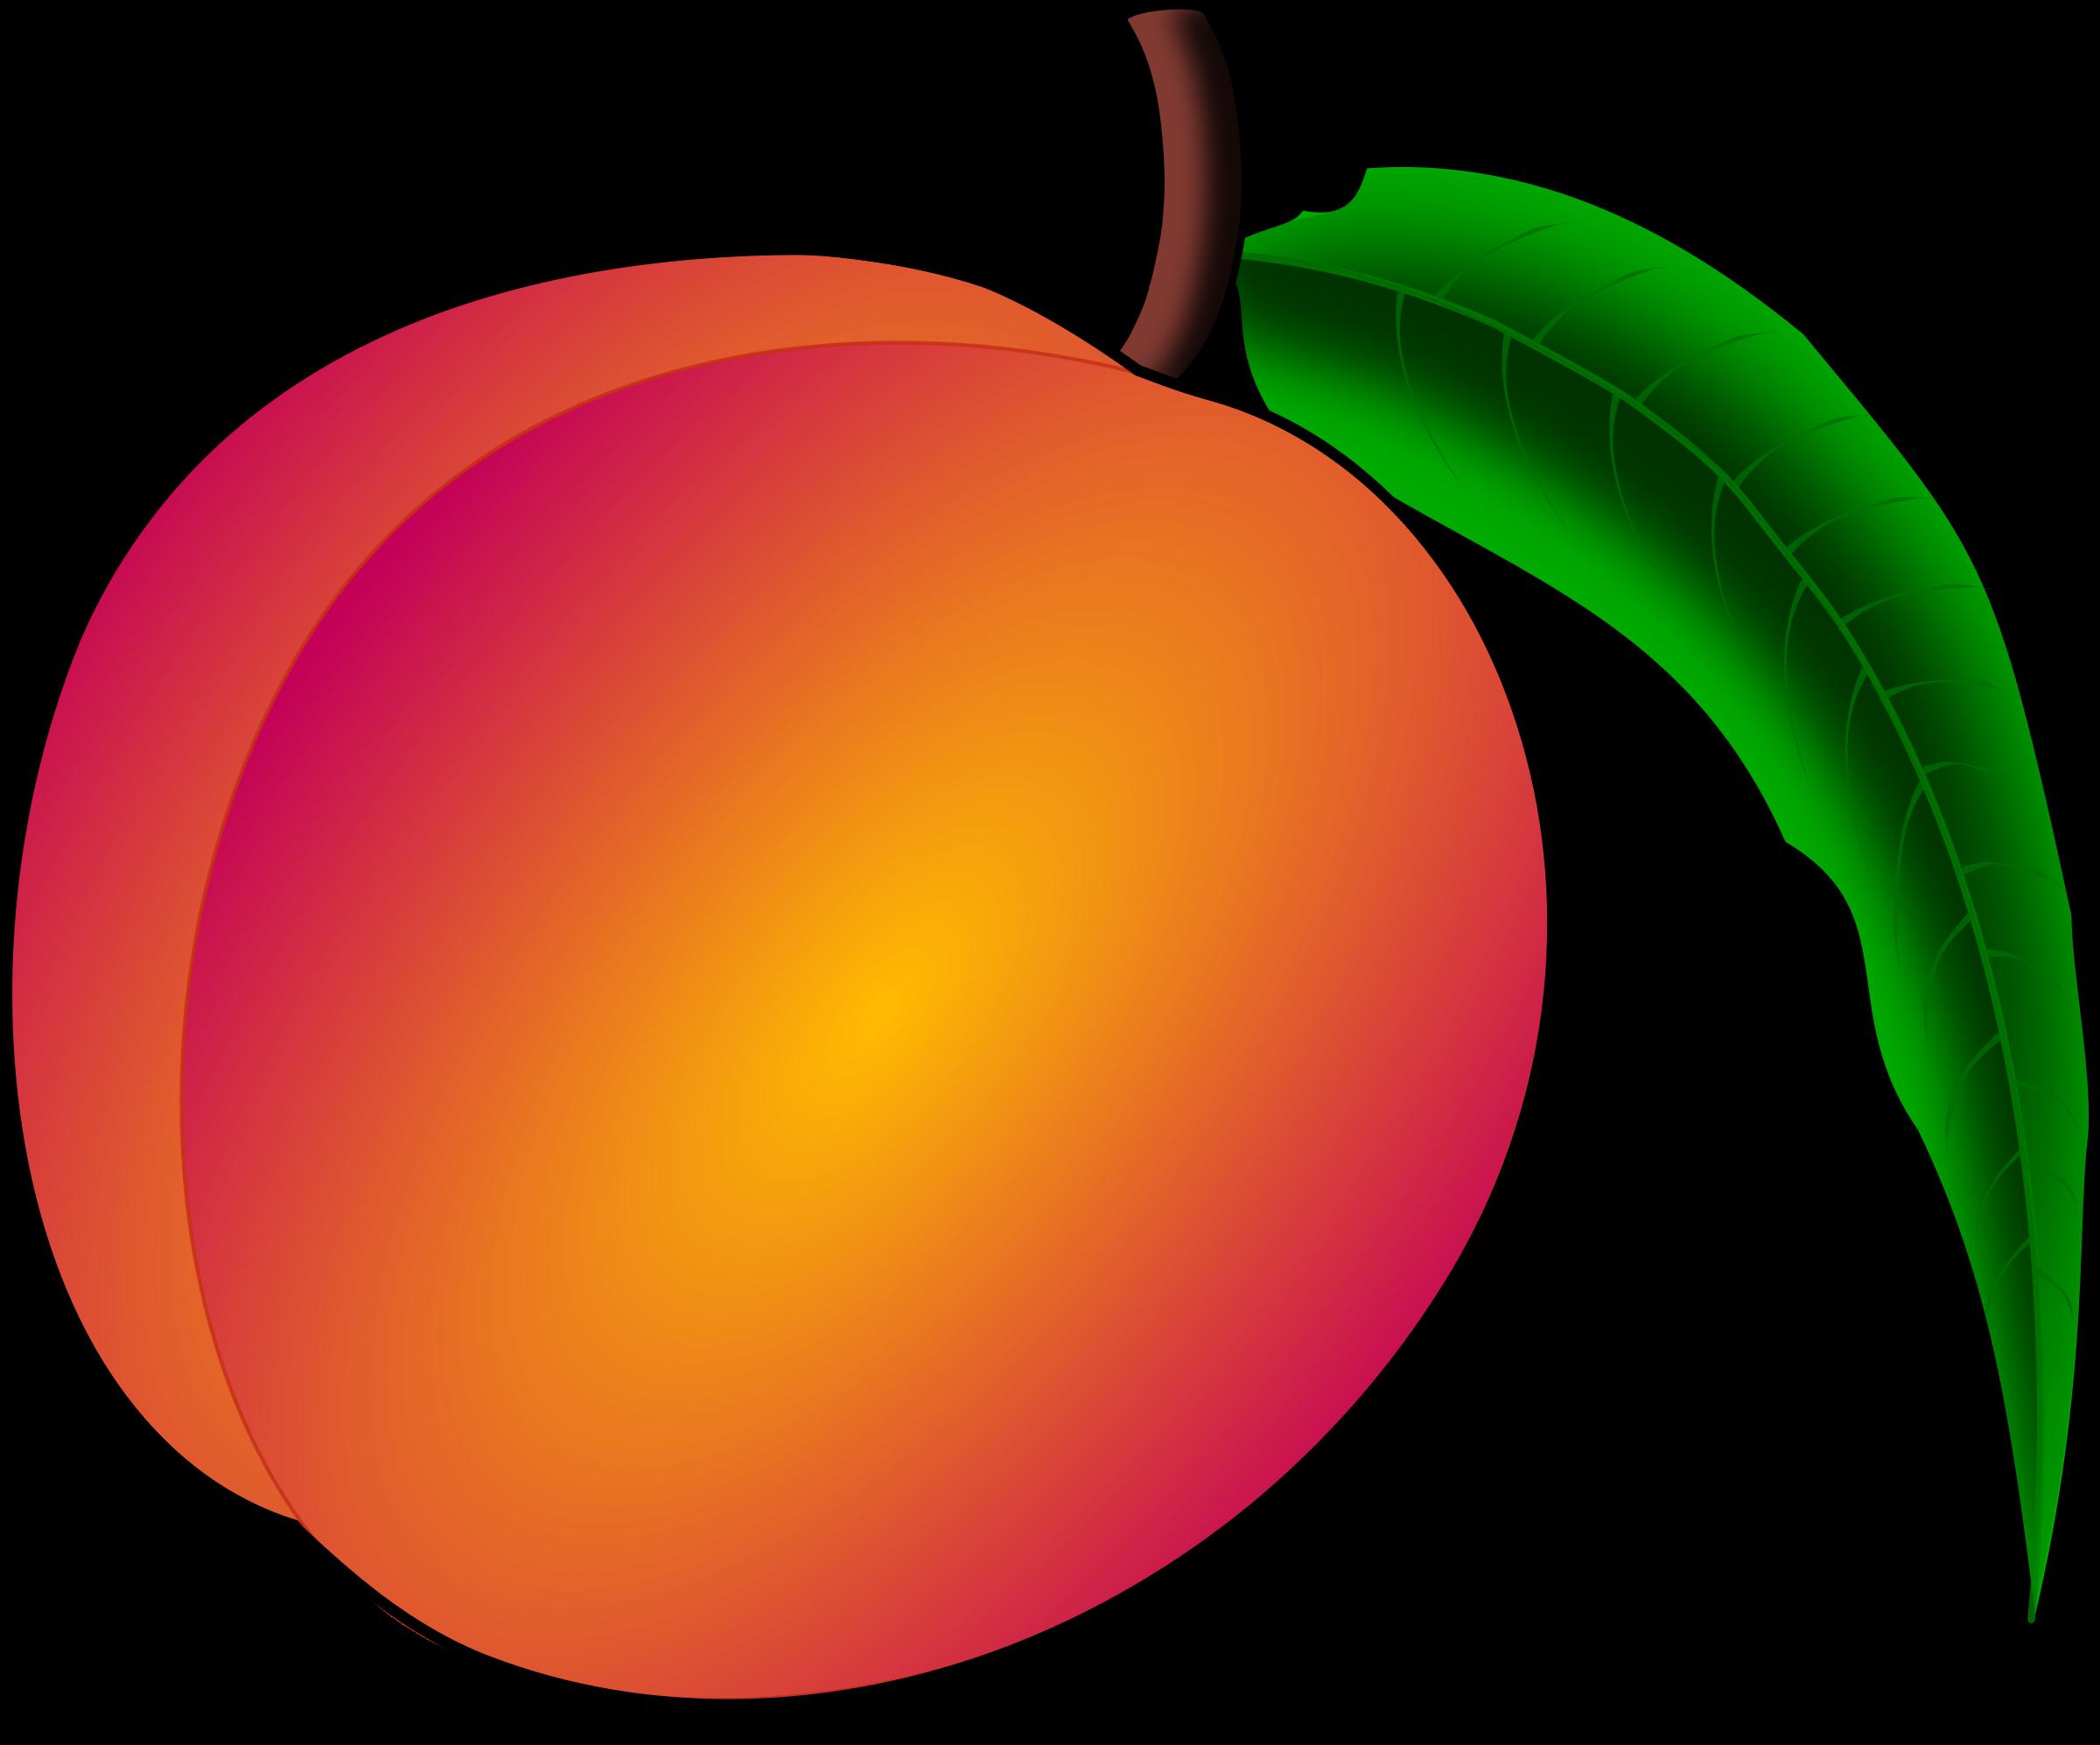 2400x1994 Fruit Clipart Image Peach Design Image